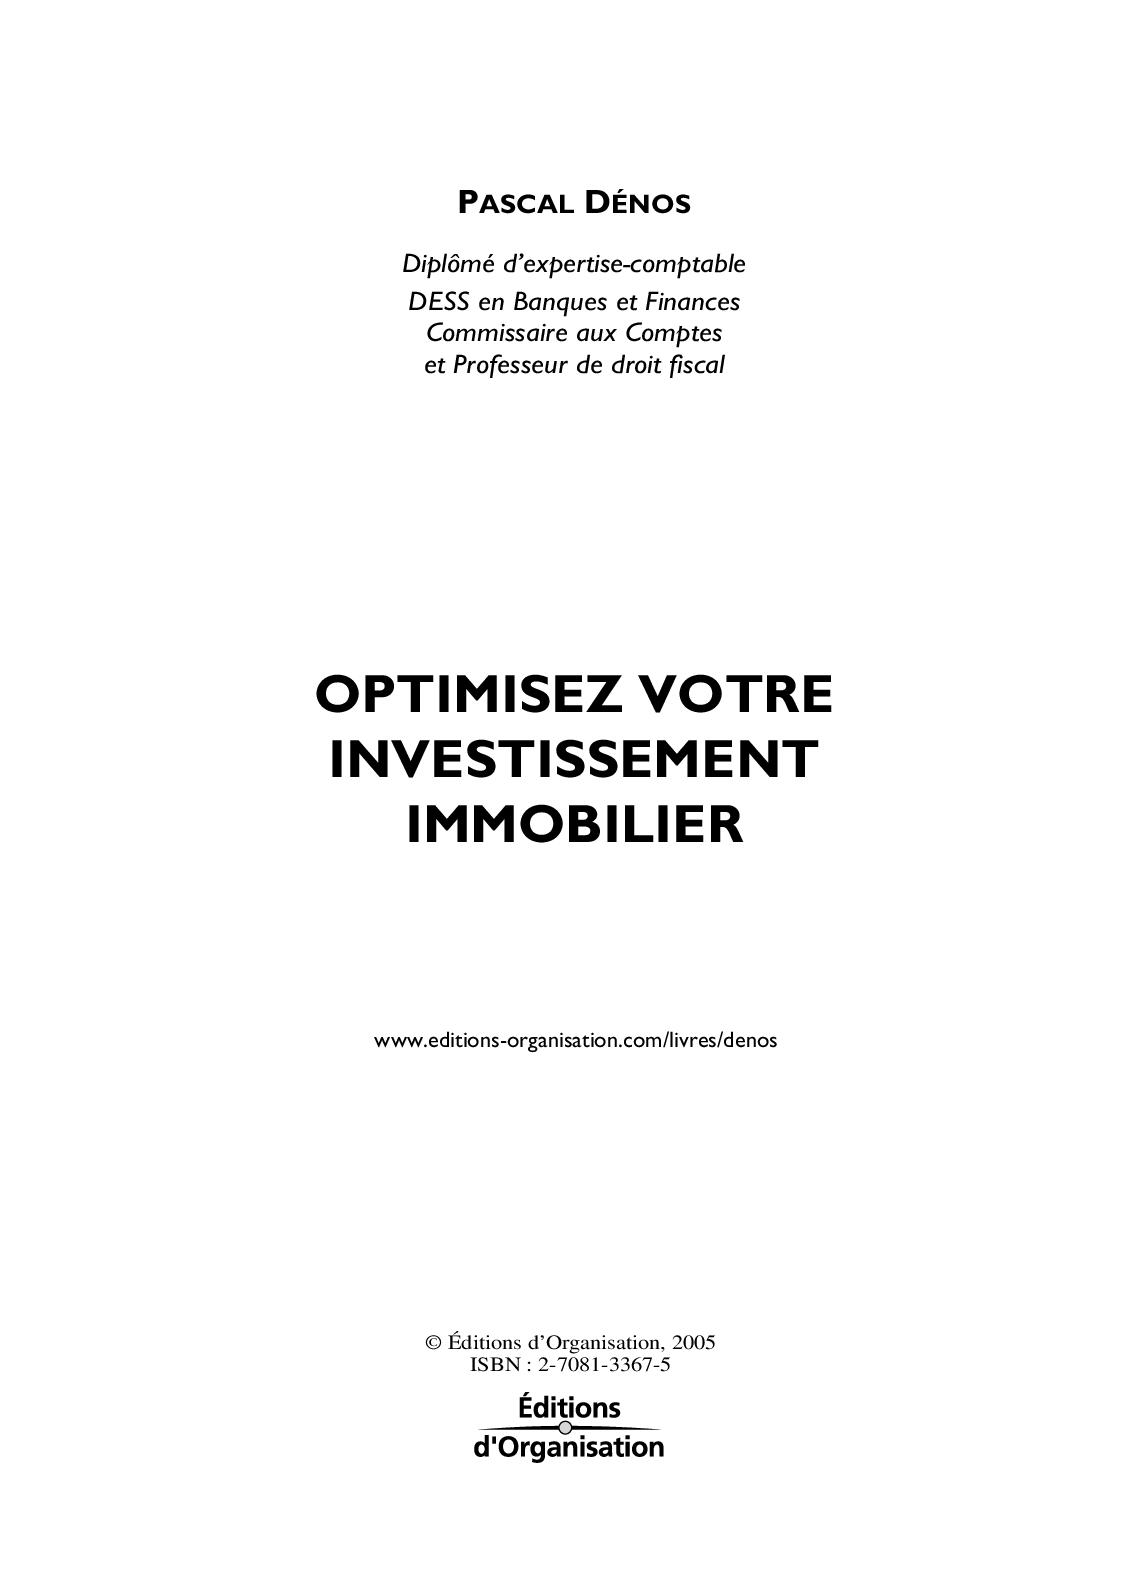 investissement immobilier pdf